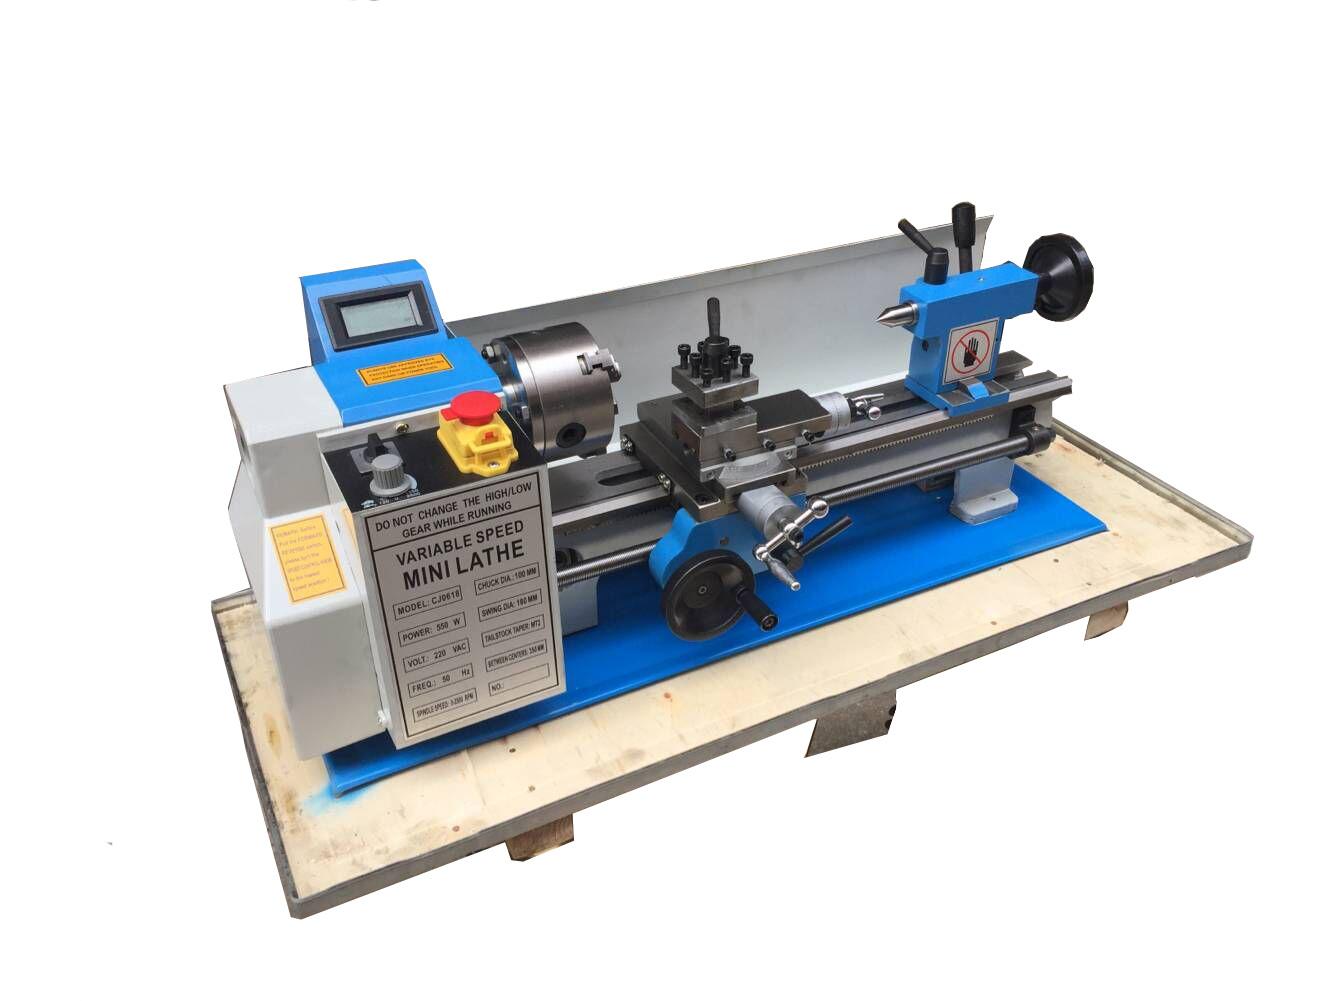 Best Selling Manual Bench Metal Mini Lathe From China - China Mini Lathe,  Hobby Lathe